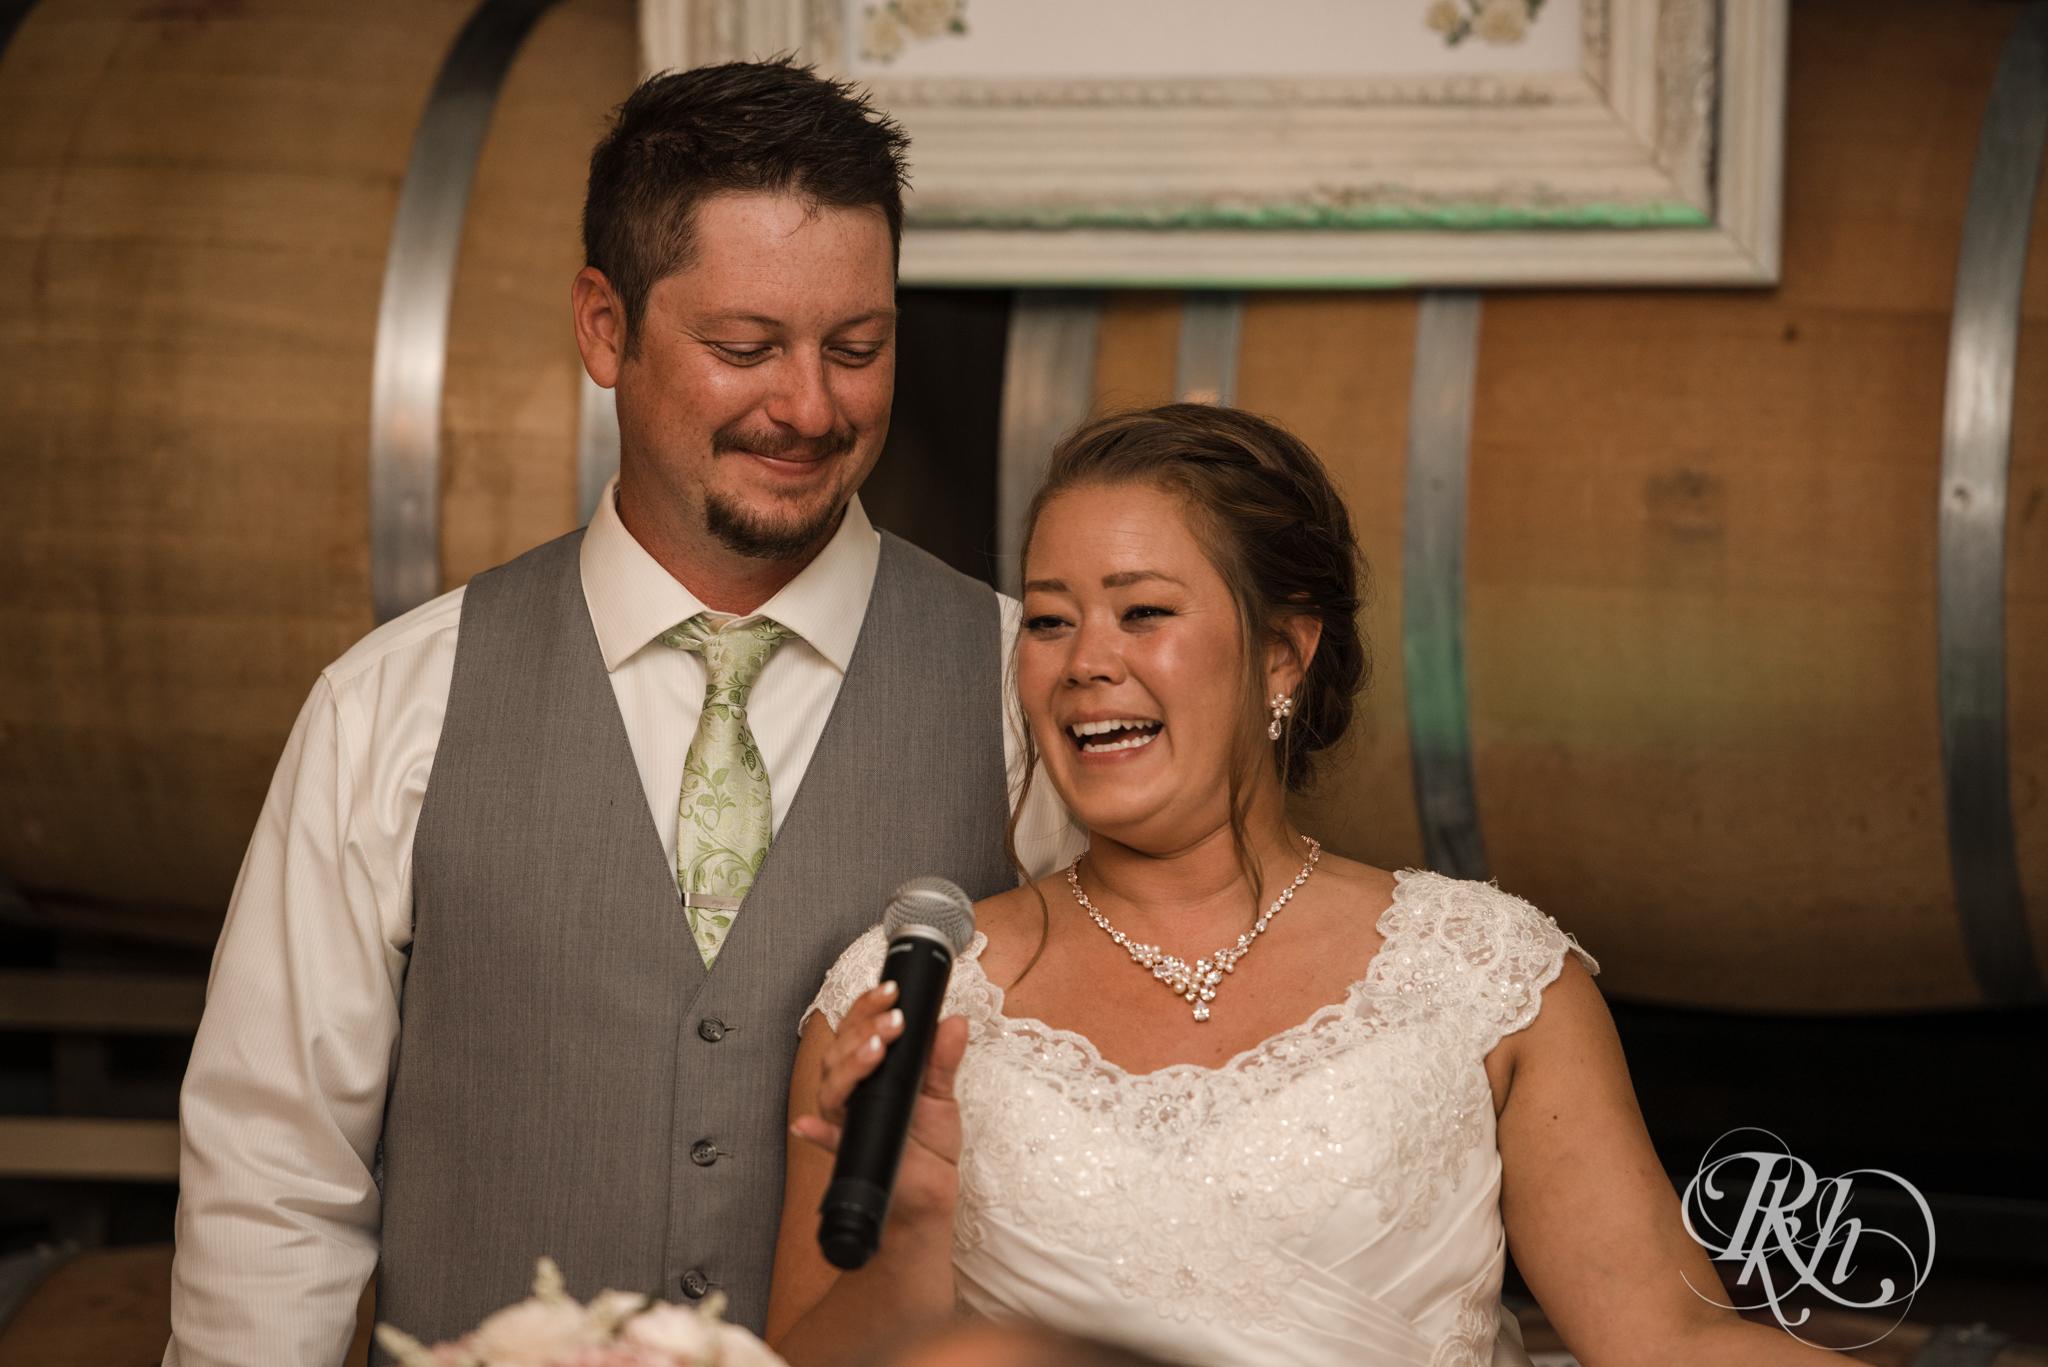 Ally & Nick - Minnesota Wedding Photography - Next Chapter Winery - RKH Images - Blog (36 of 57).jpg